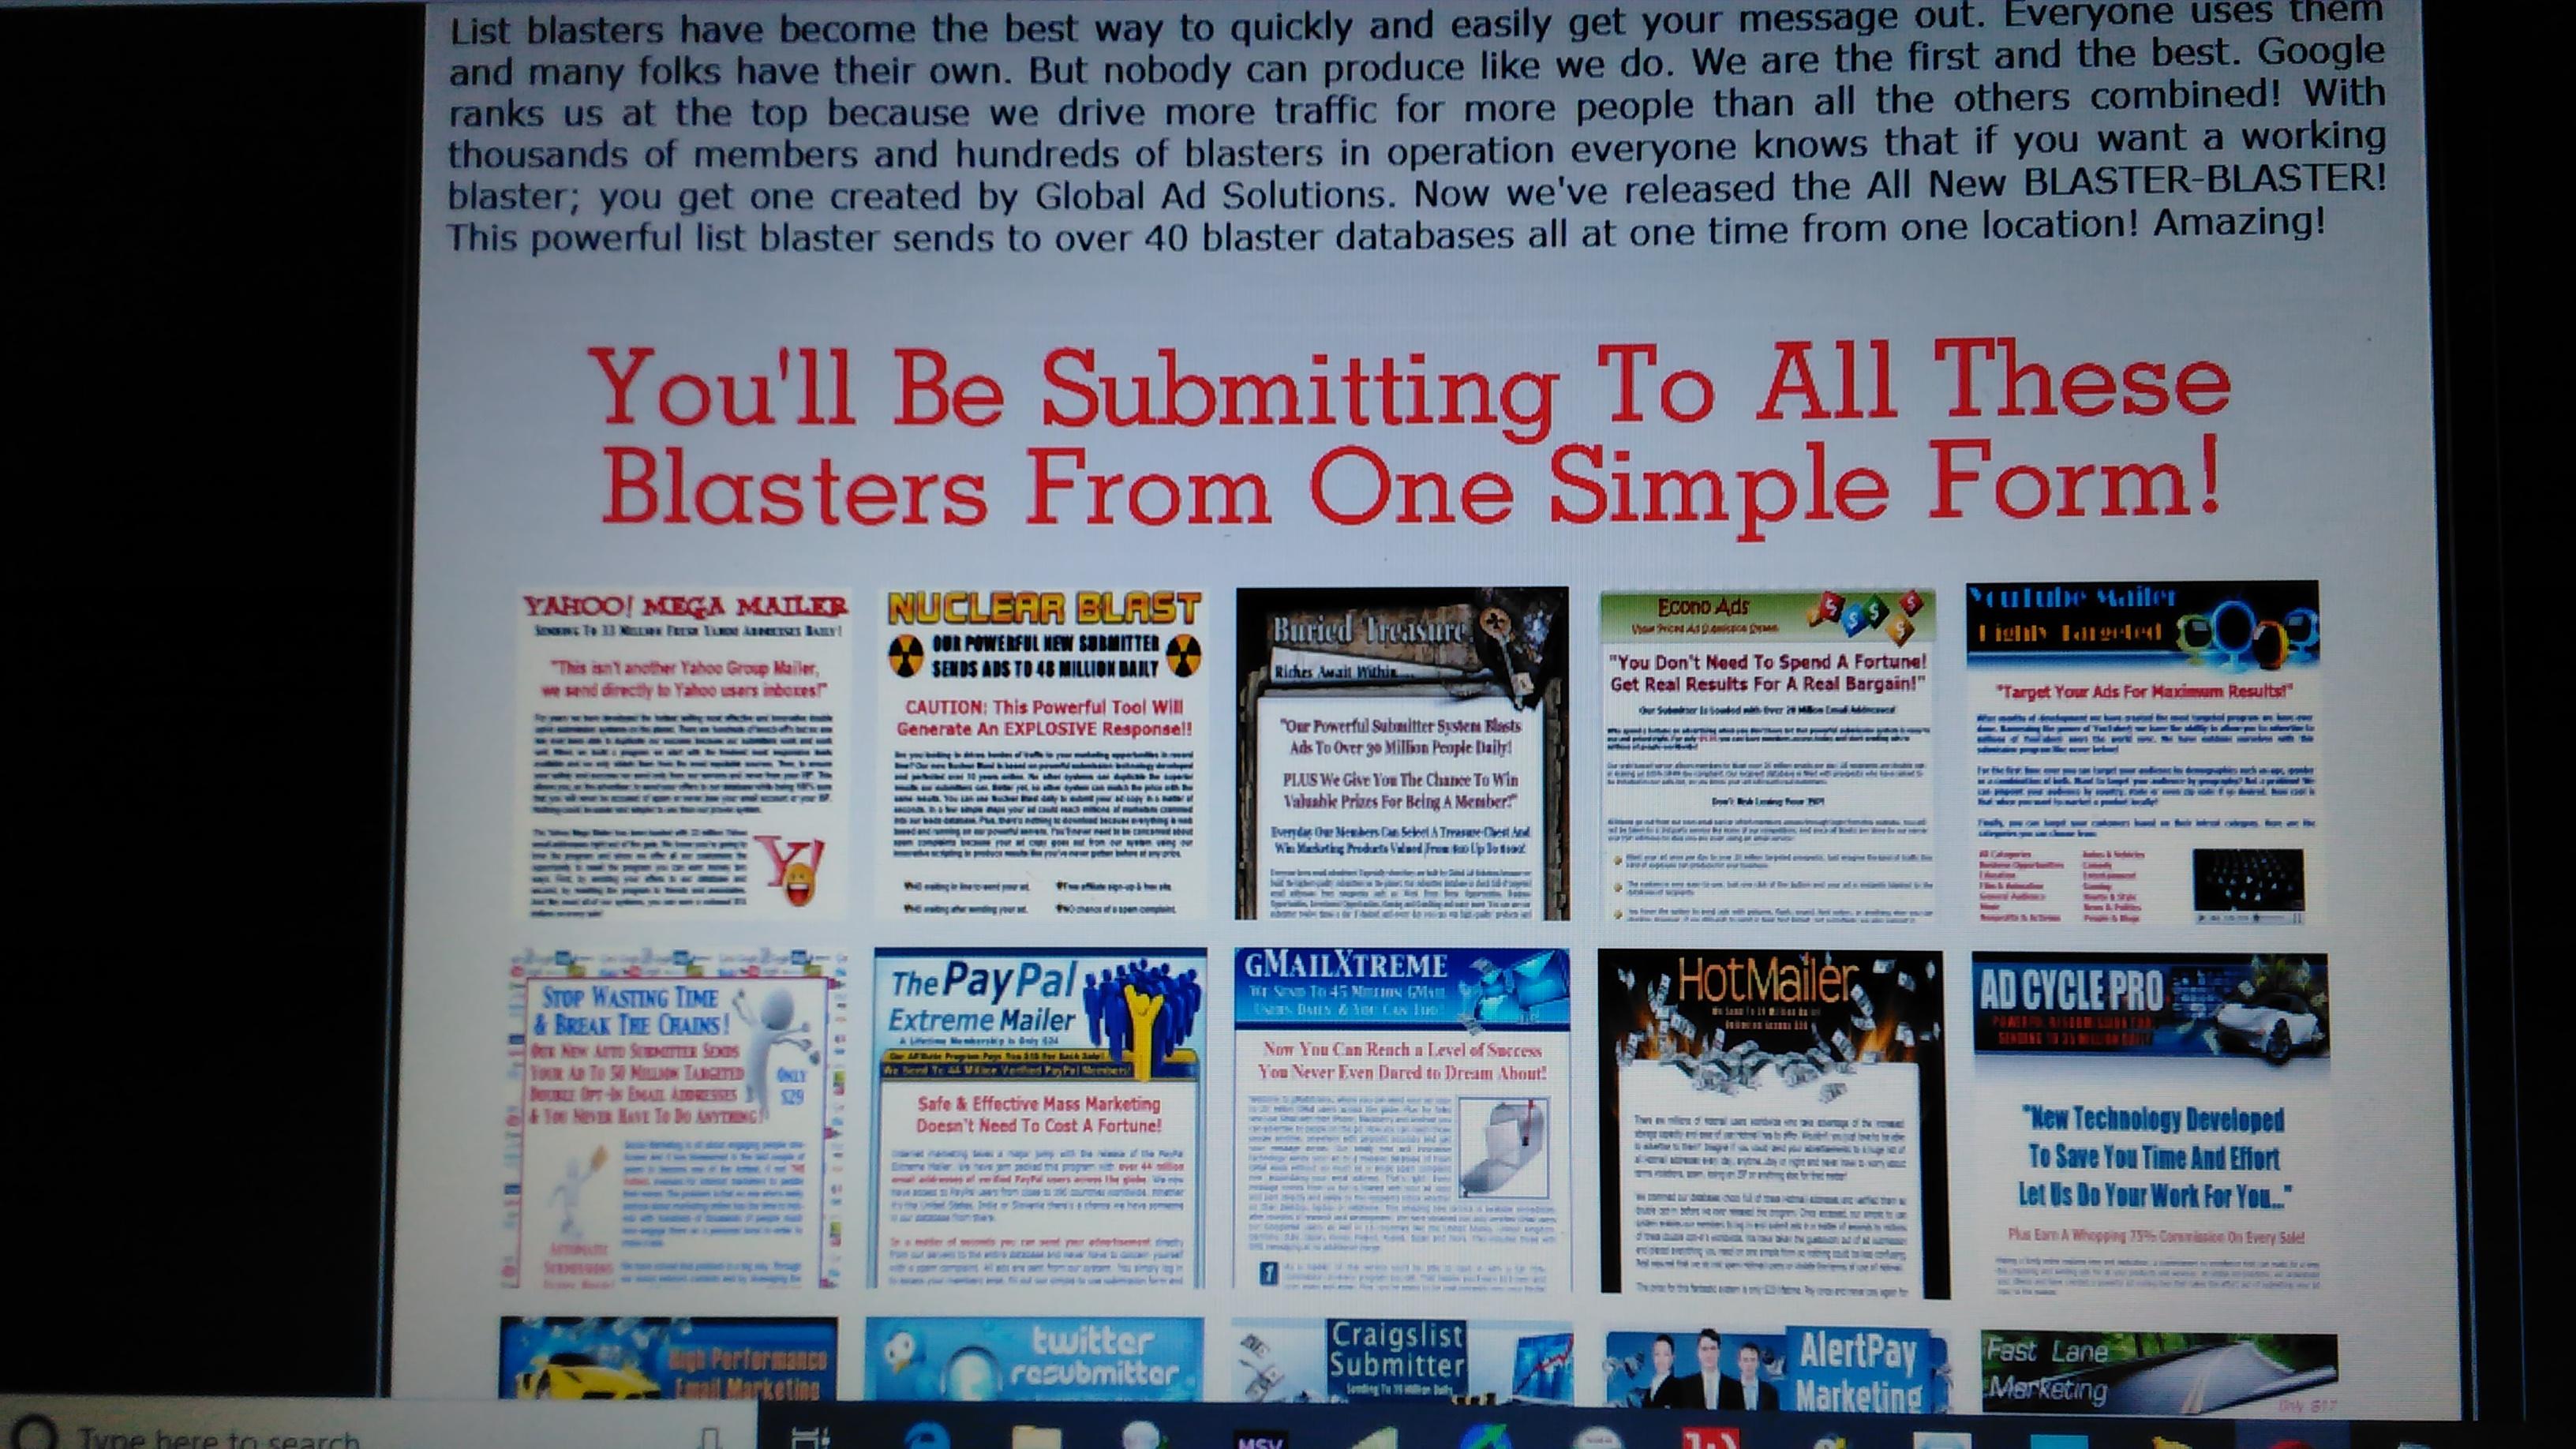 Over 100 Million Email Blaster From 40 Blast Platforms